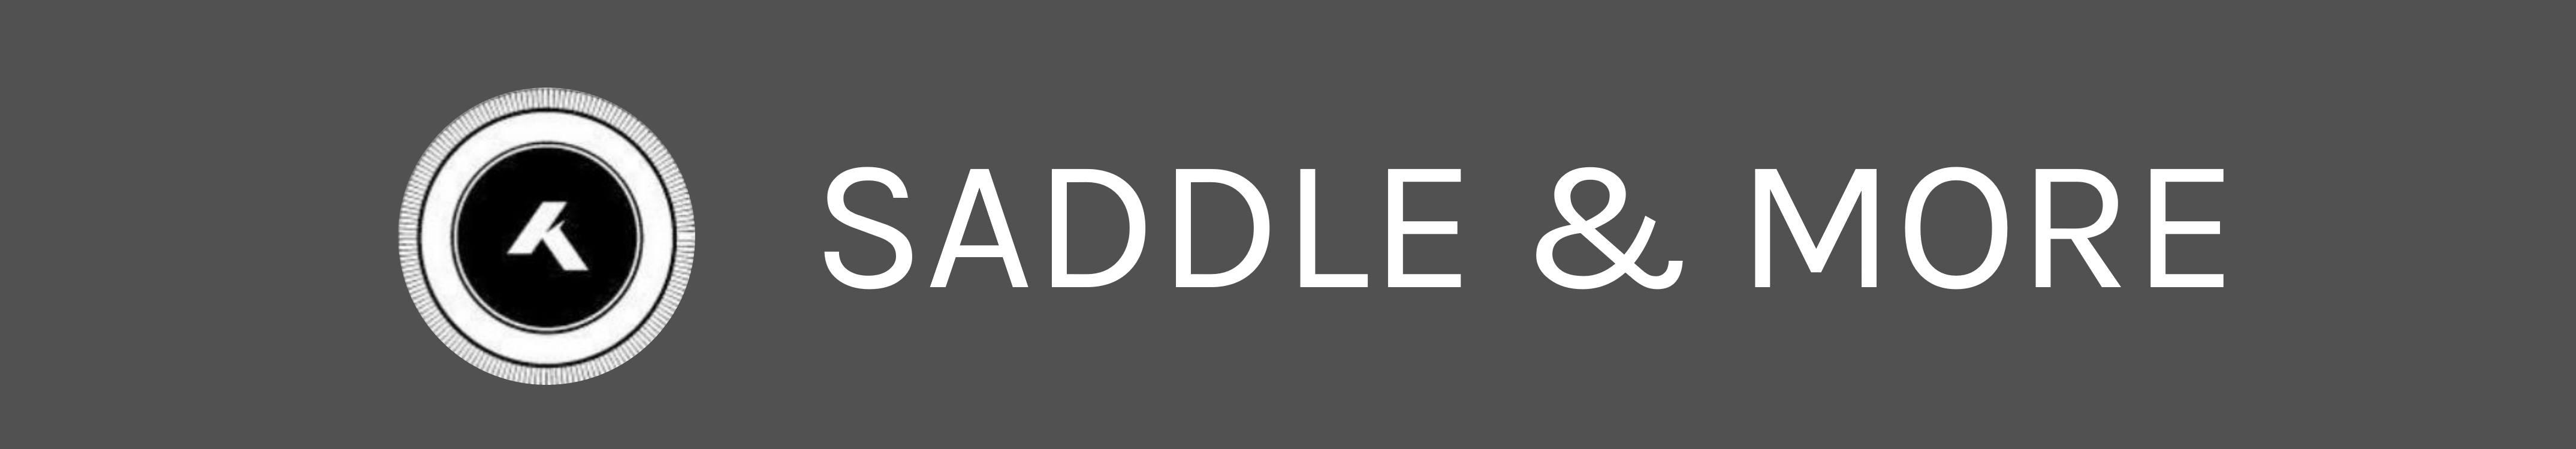 KHE-Banner-saddle-more